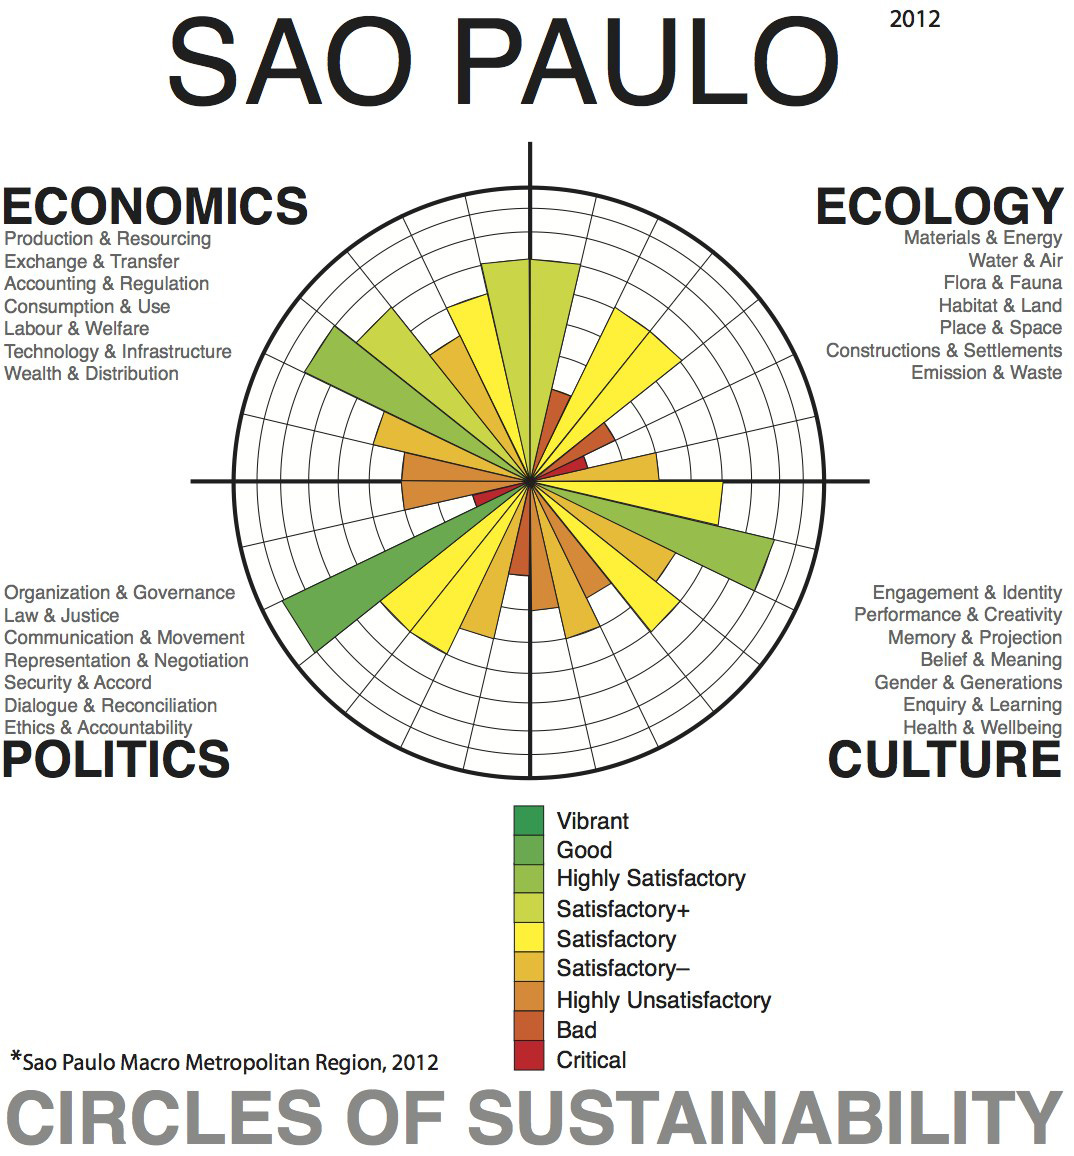 pest analysis on sao paulo 巴西pest - pest analysis politics brazilian constitution established  巴西pest_经管营销  in sao paulo and rio formed the border.